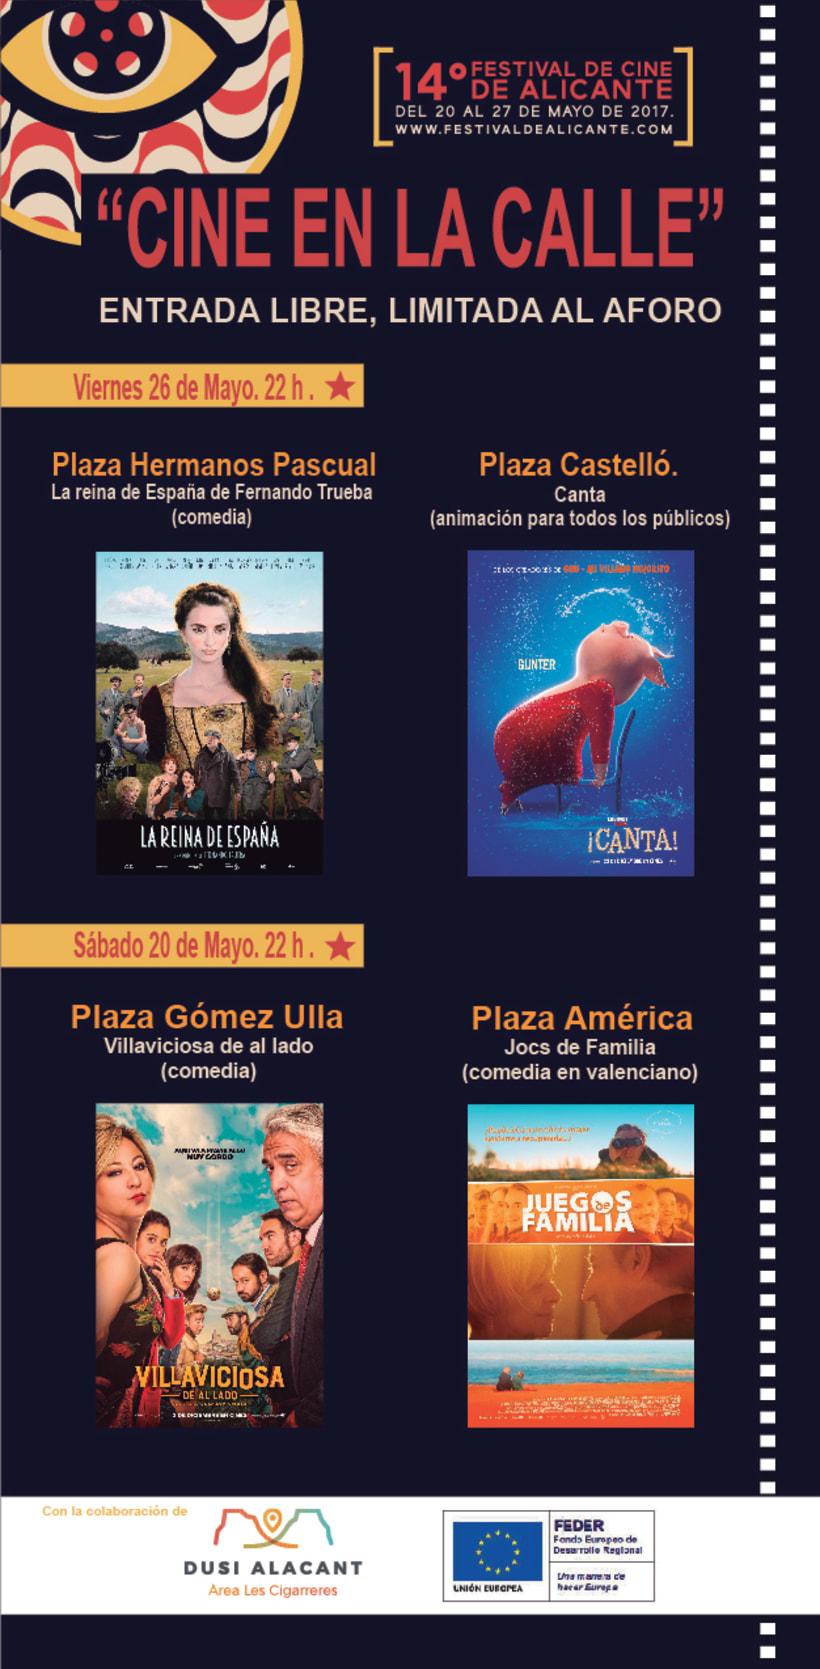 Festival de Cine Alicante 11